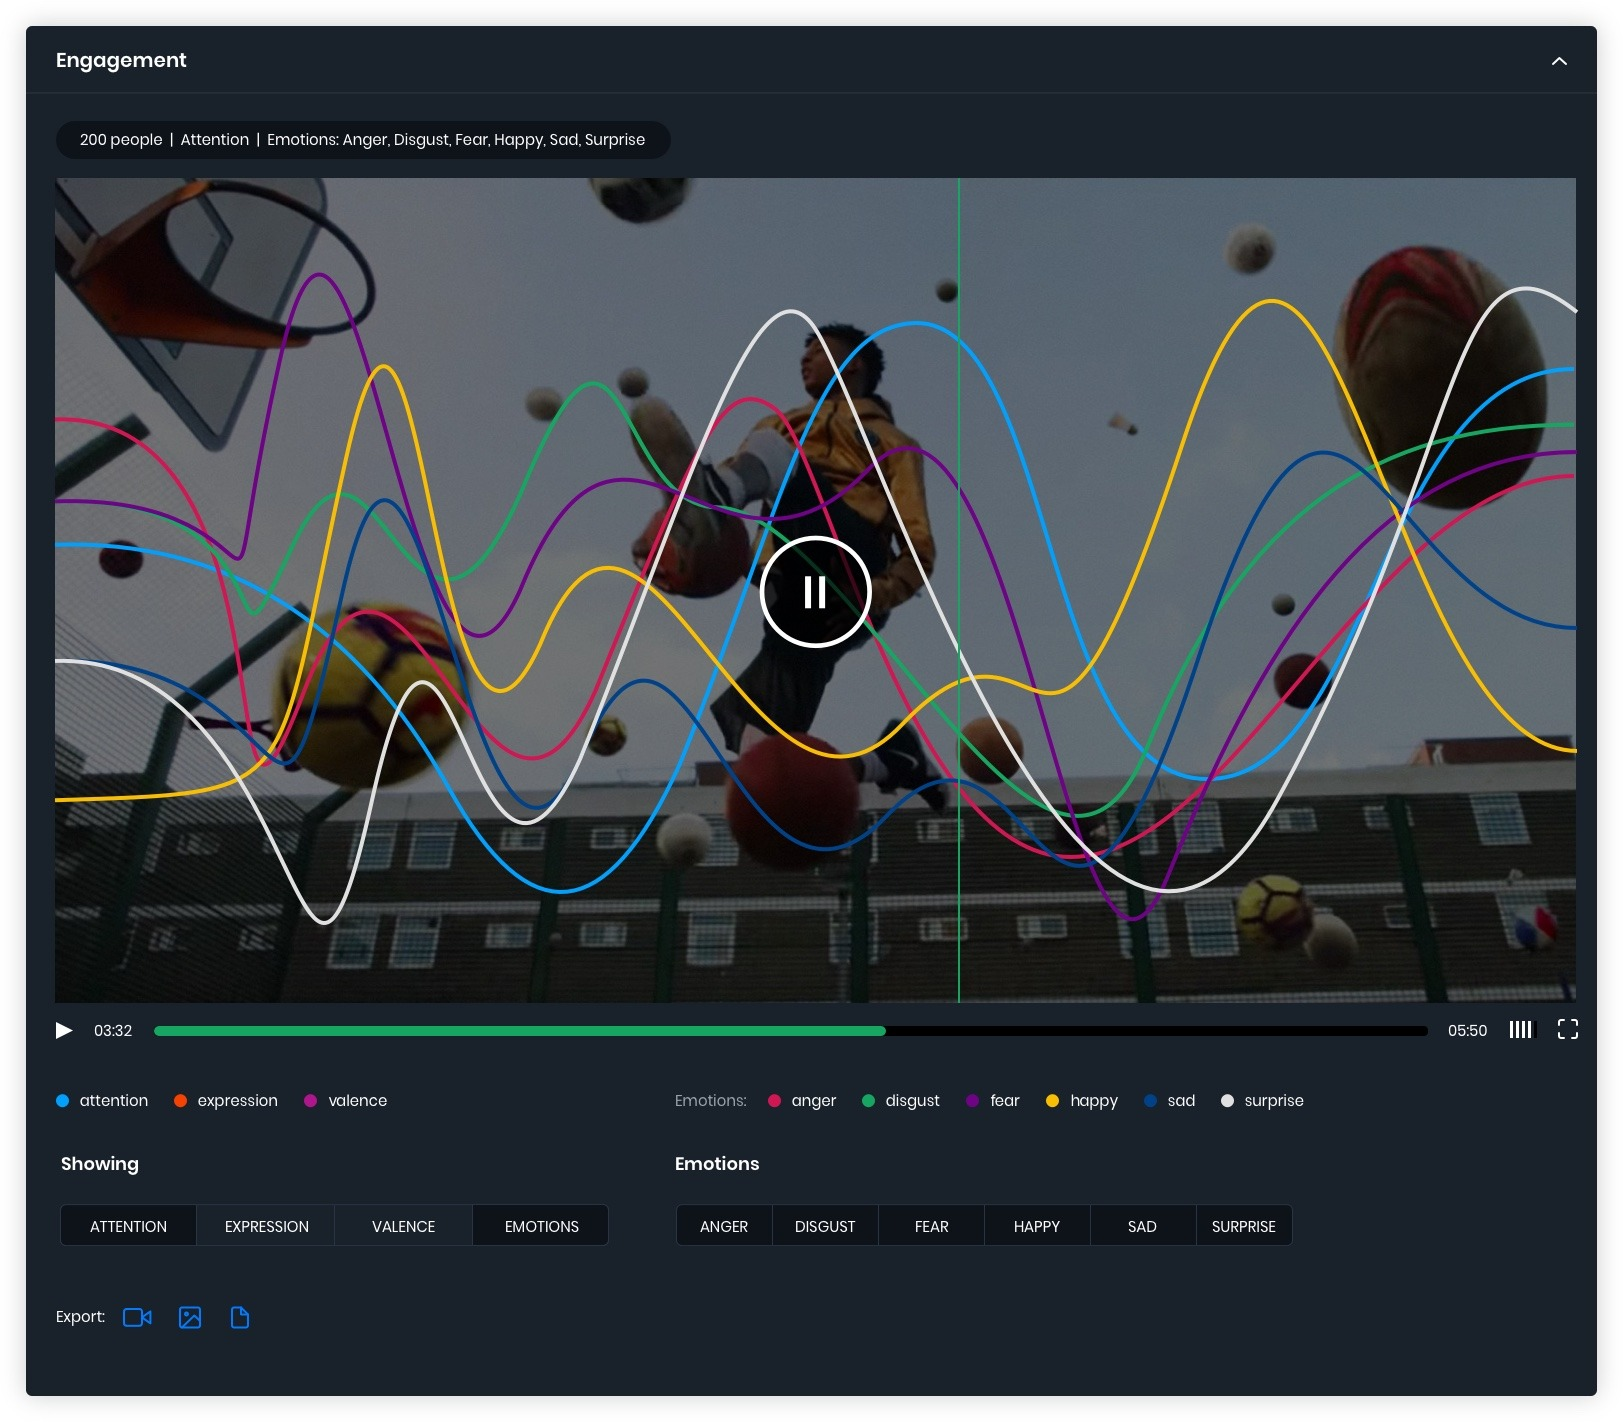 HX Workbench - engagement video overlay report